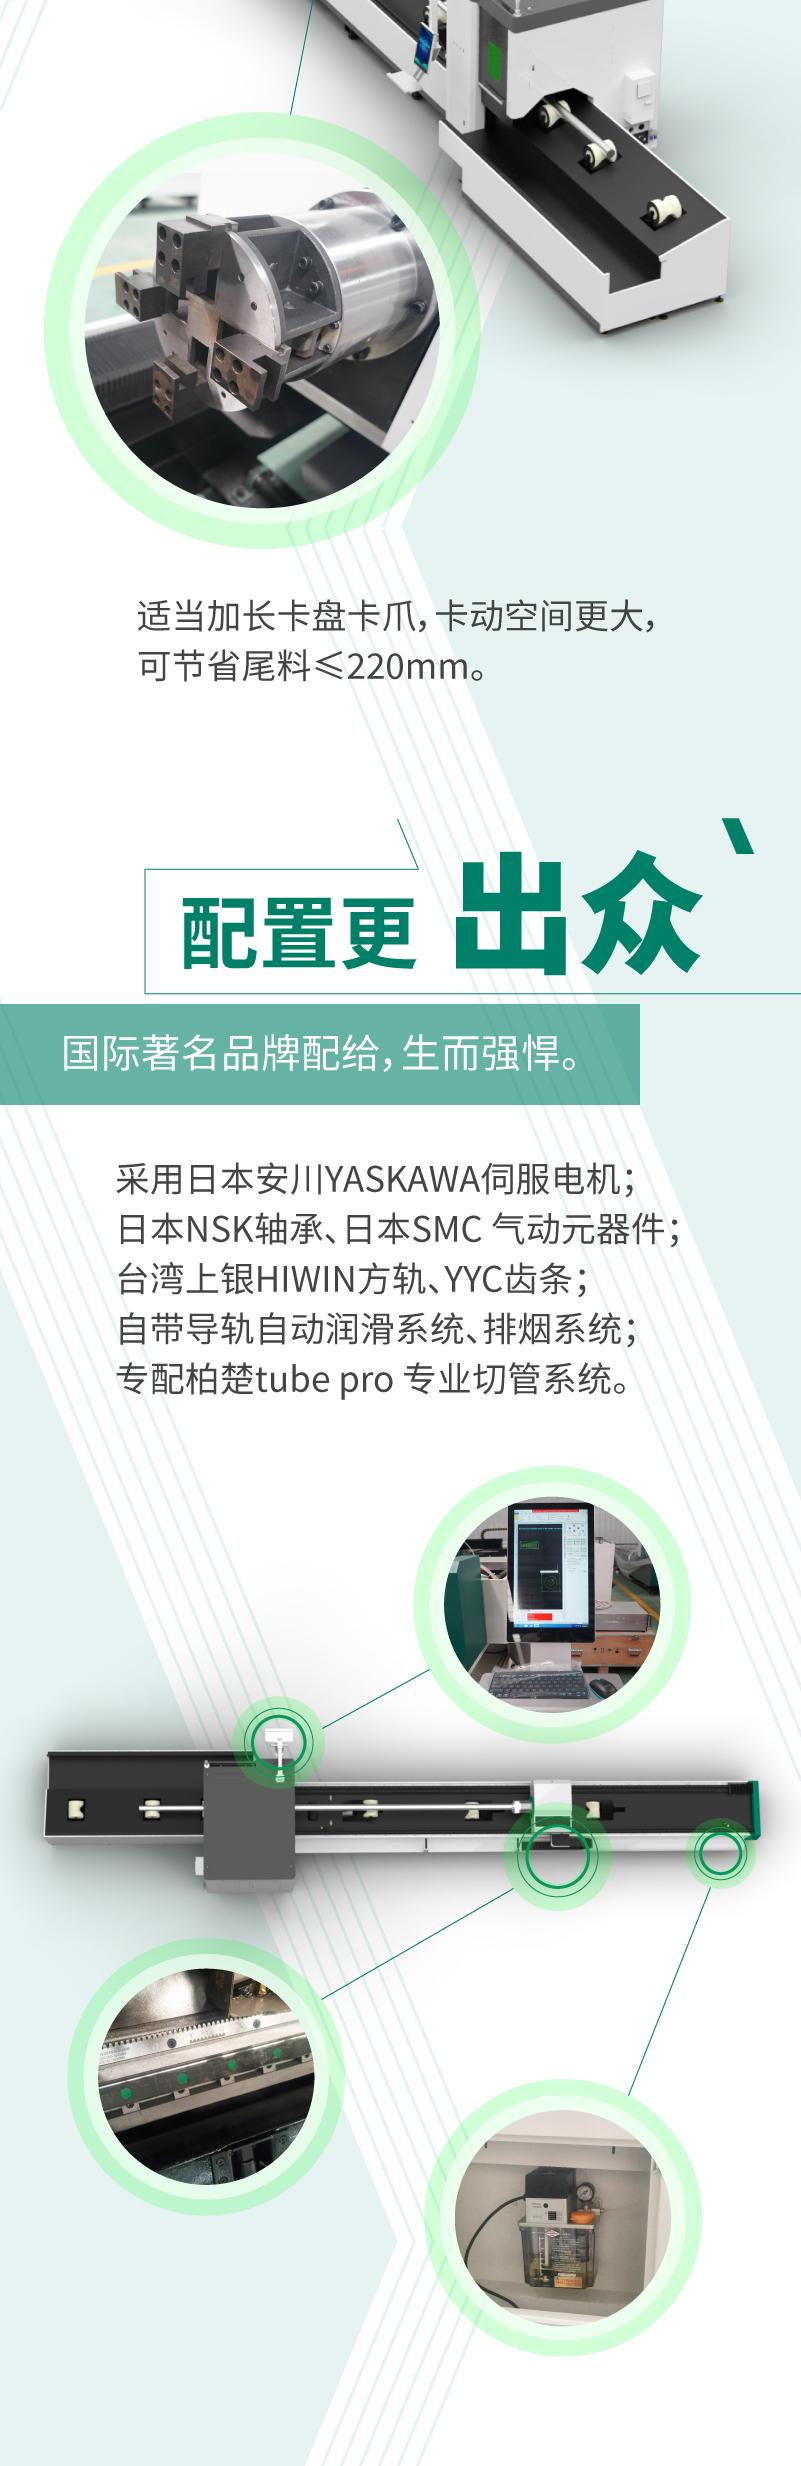 or-t 升级微信公众号-04.jpg